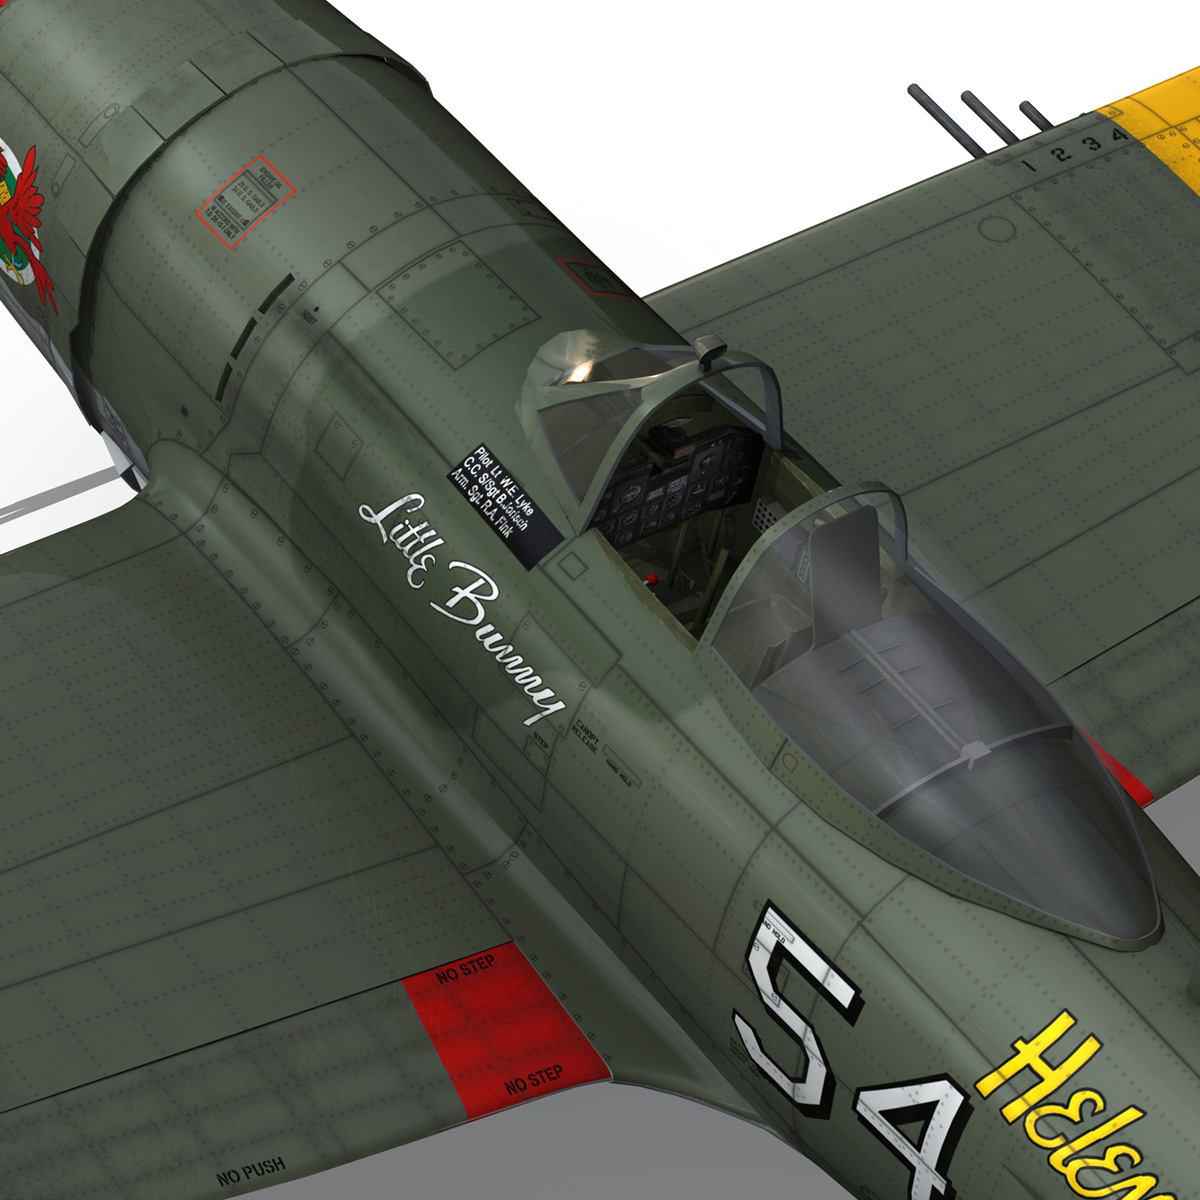 republic p-47d thunderbolt – little bunny 3d model fbx c4d lwo obj 274235